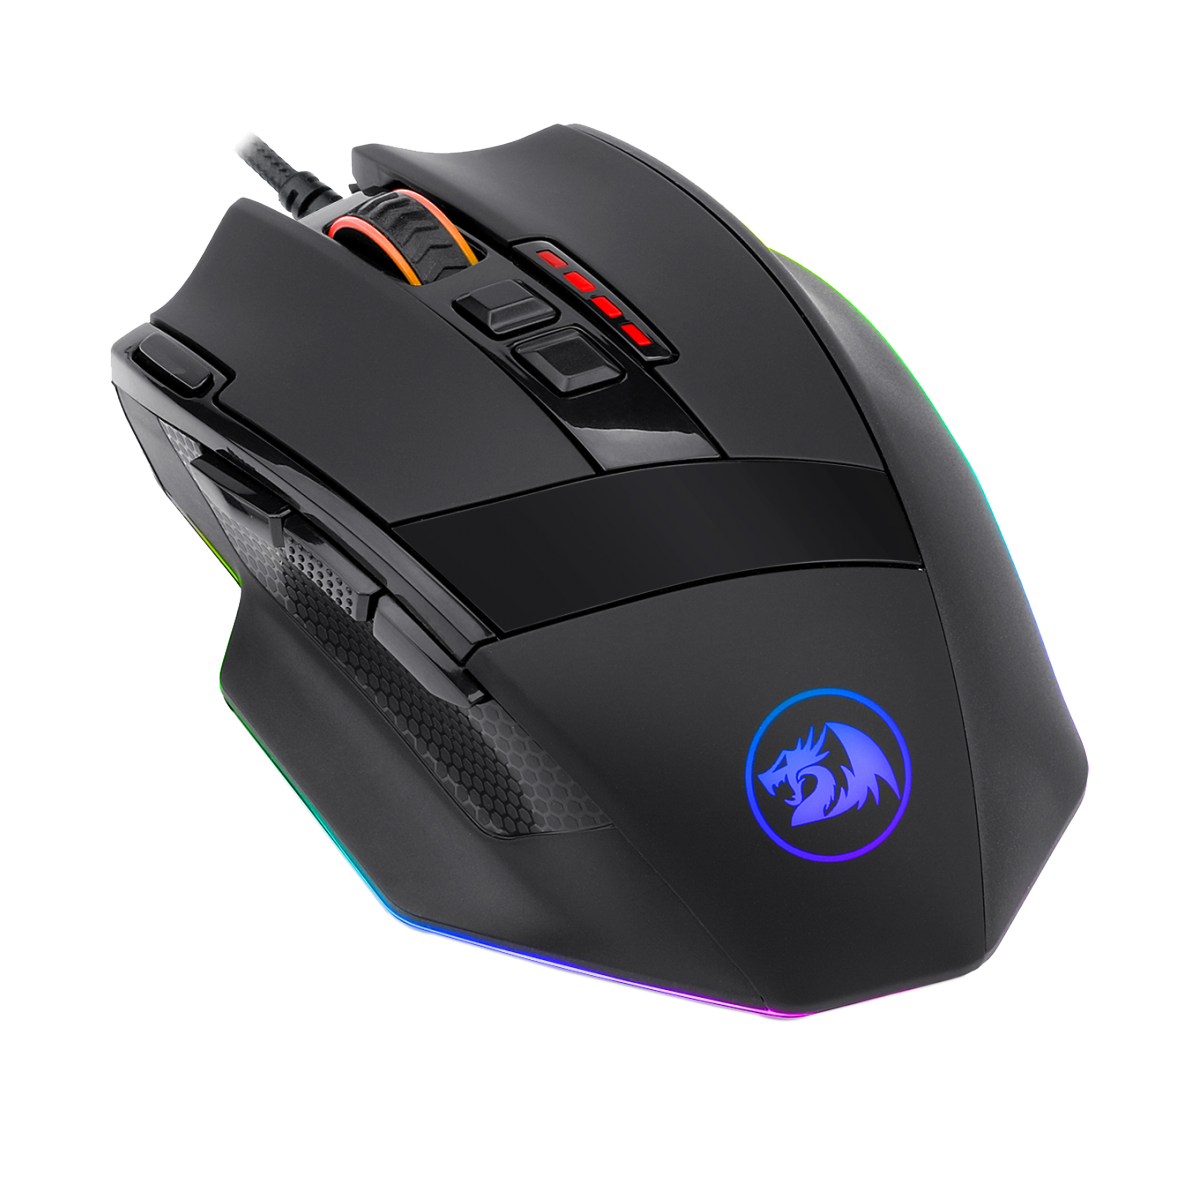 Mouse Gamer Redragon Sniper M801 RGB, 12400 DPI, 9 Botões Programáveis, Black